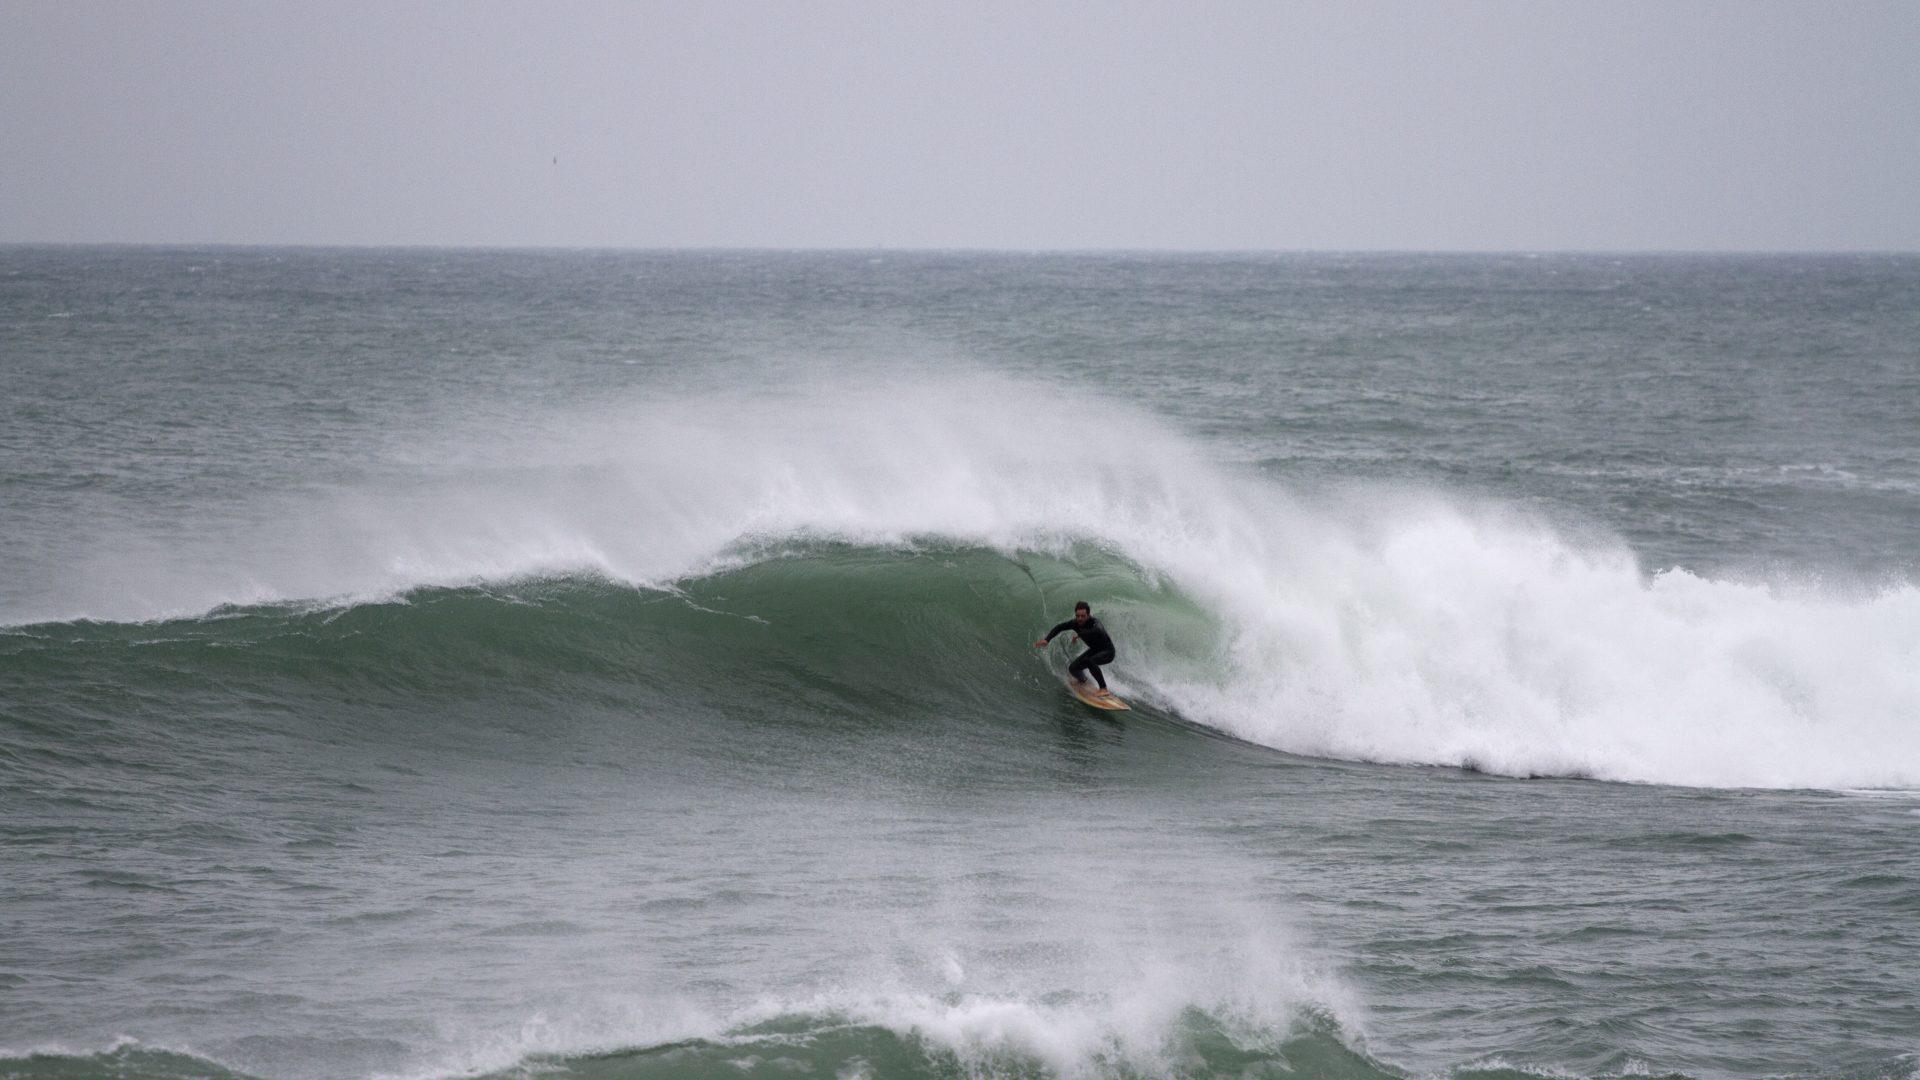 Photo credit Otter Surfboards, Mat Arney